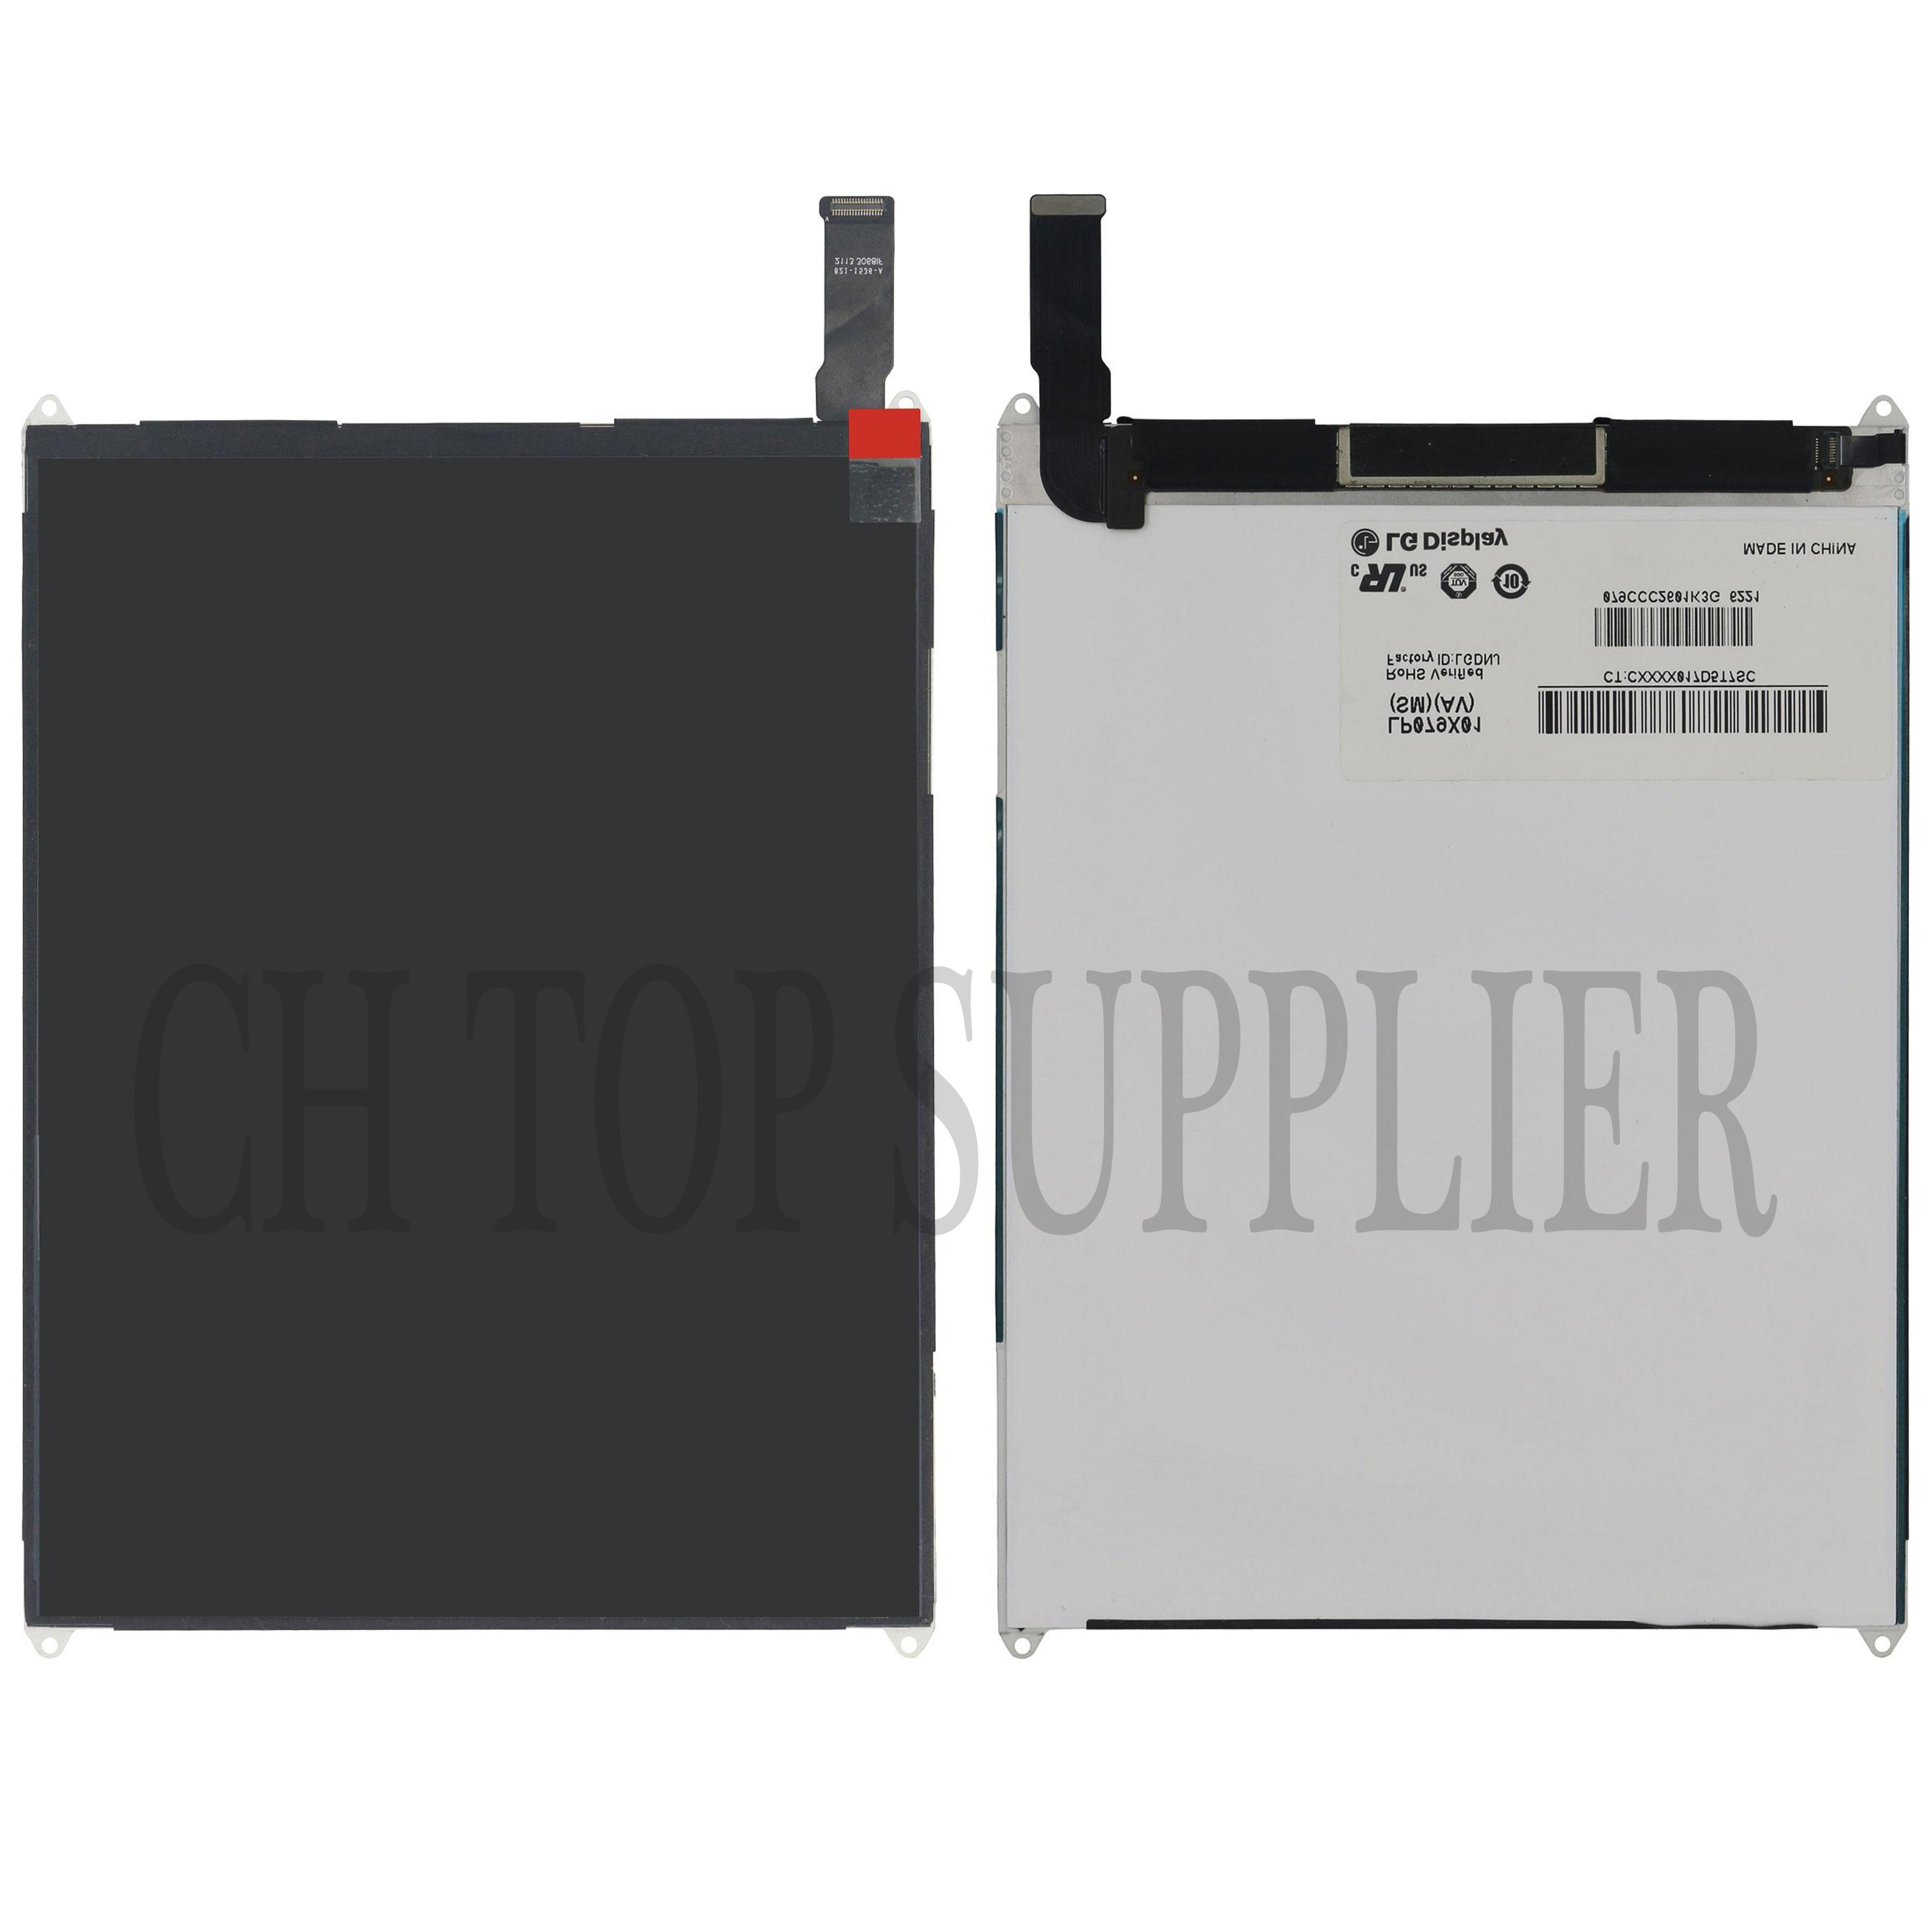 Original New LCD Screen for SUPRA M847G Tablet LCD Screen Replacement Free Shipping new original lcd screen sl008dh24b01